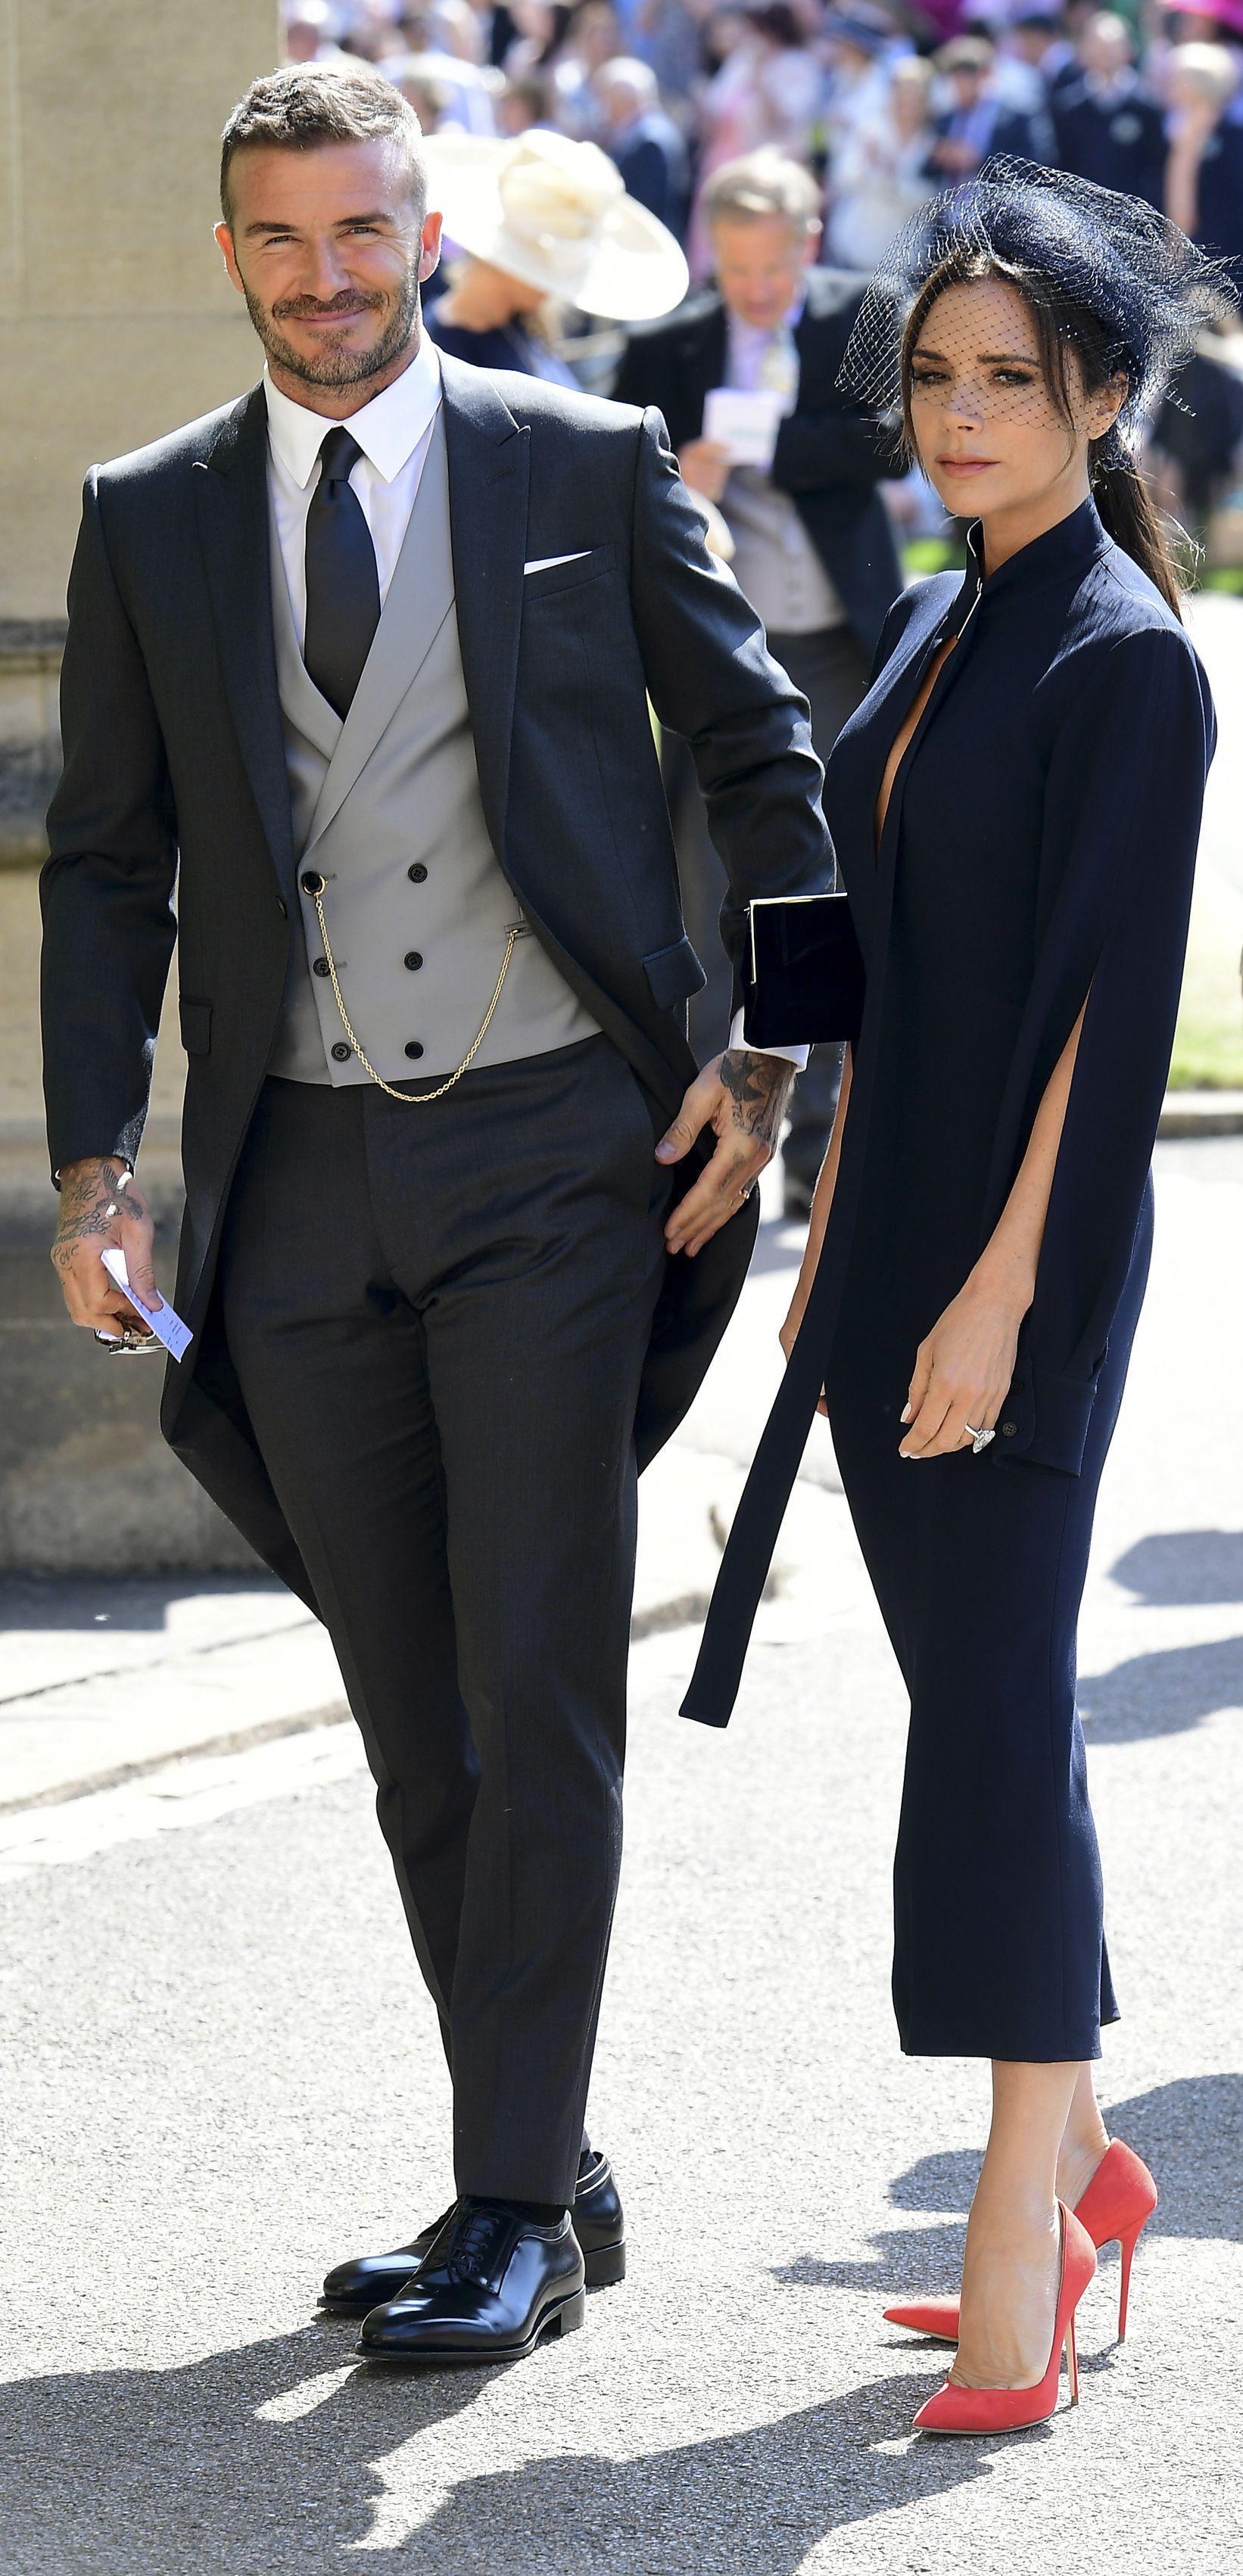 https://hips.hearstapps.com/hmg-prod.s3.amazonaws.com/images/victoria-beckham-royal-wedding-2018-1526724629.jpg